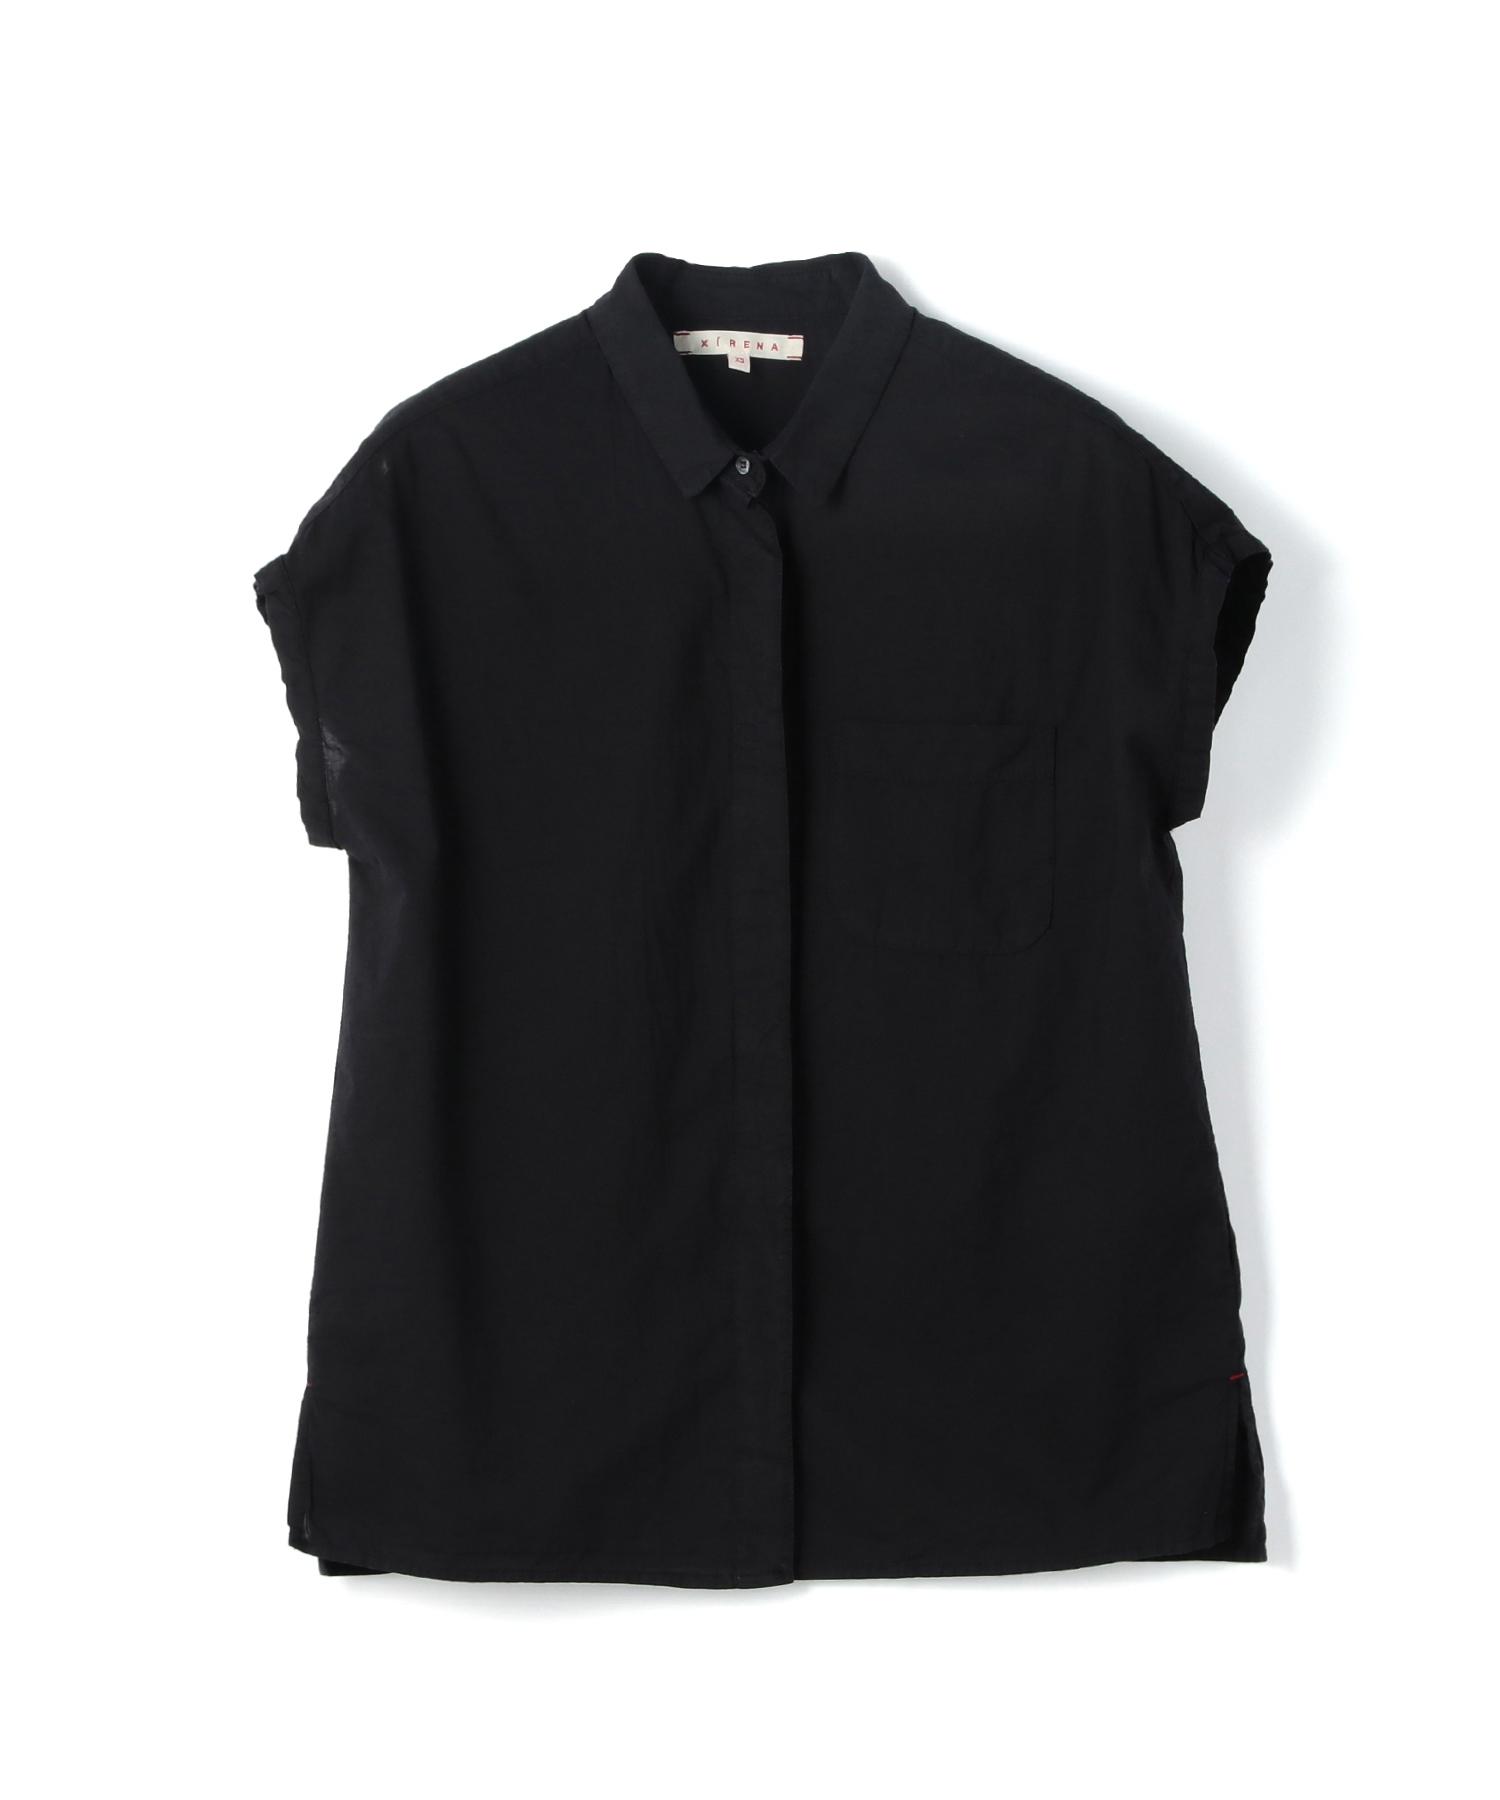 XIRENA / ハーフスリーブシャツ